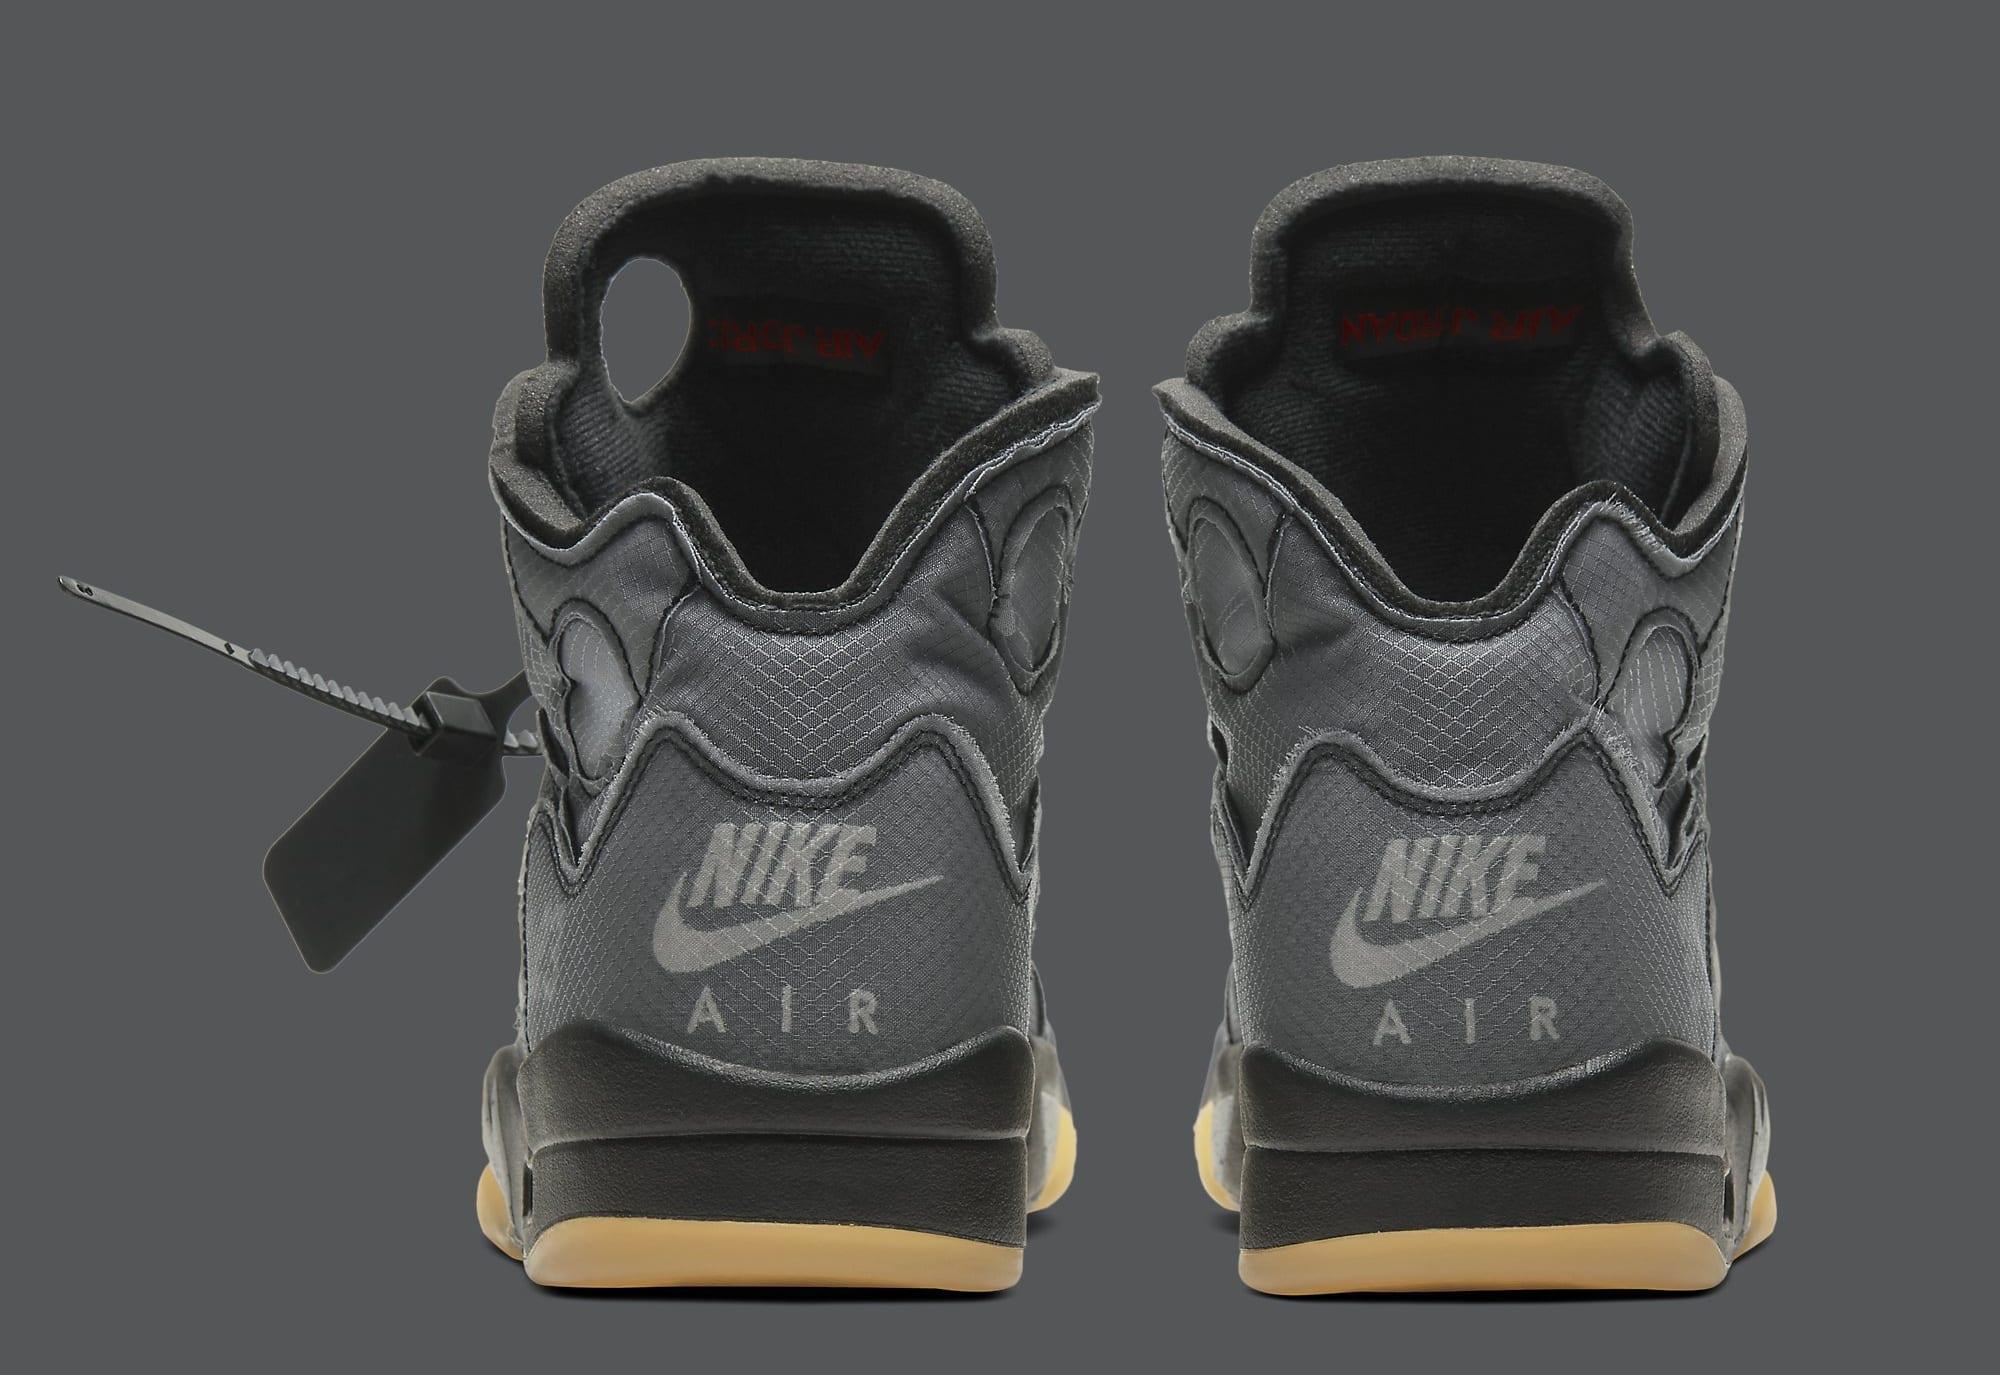 Off-White x Air Jordan 5 CT8480-001 (Heel)